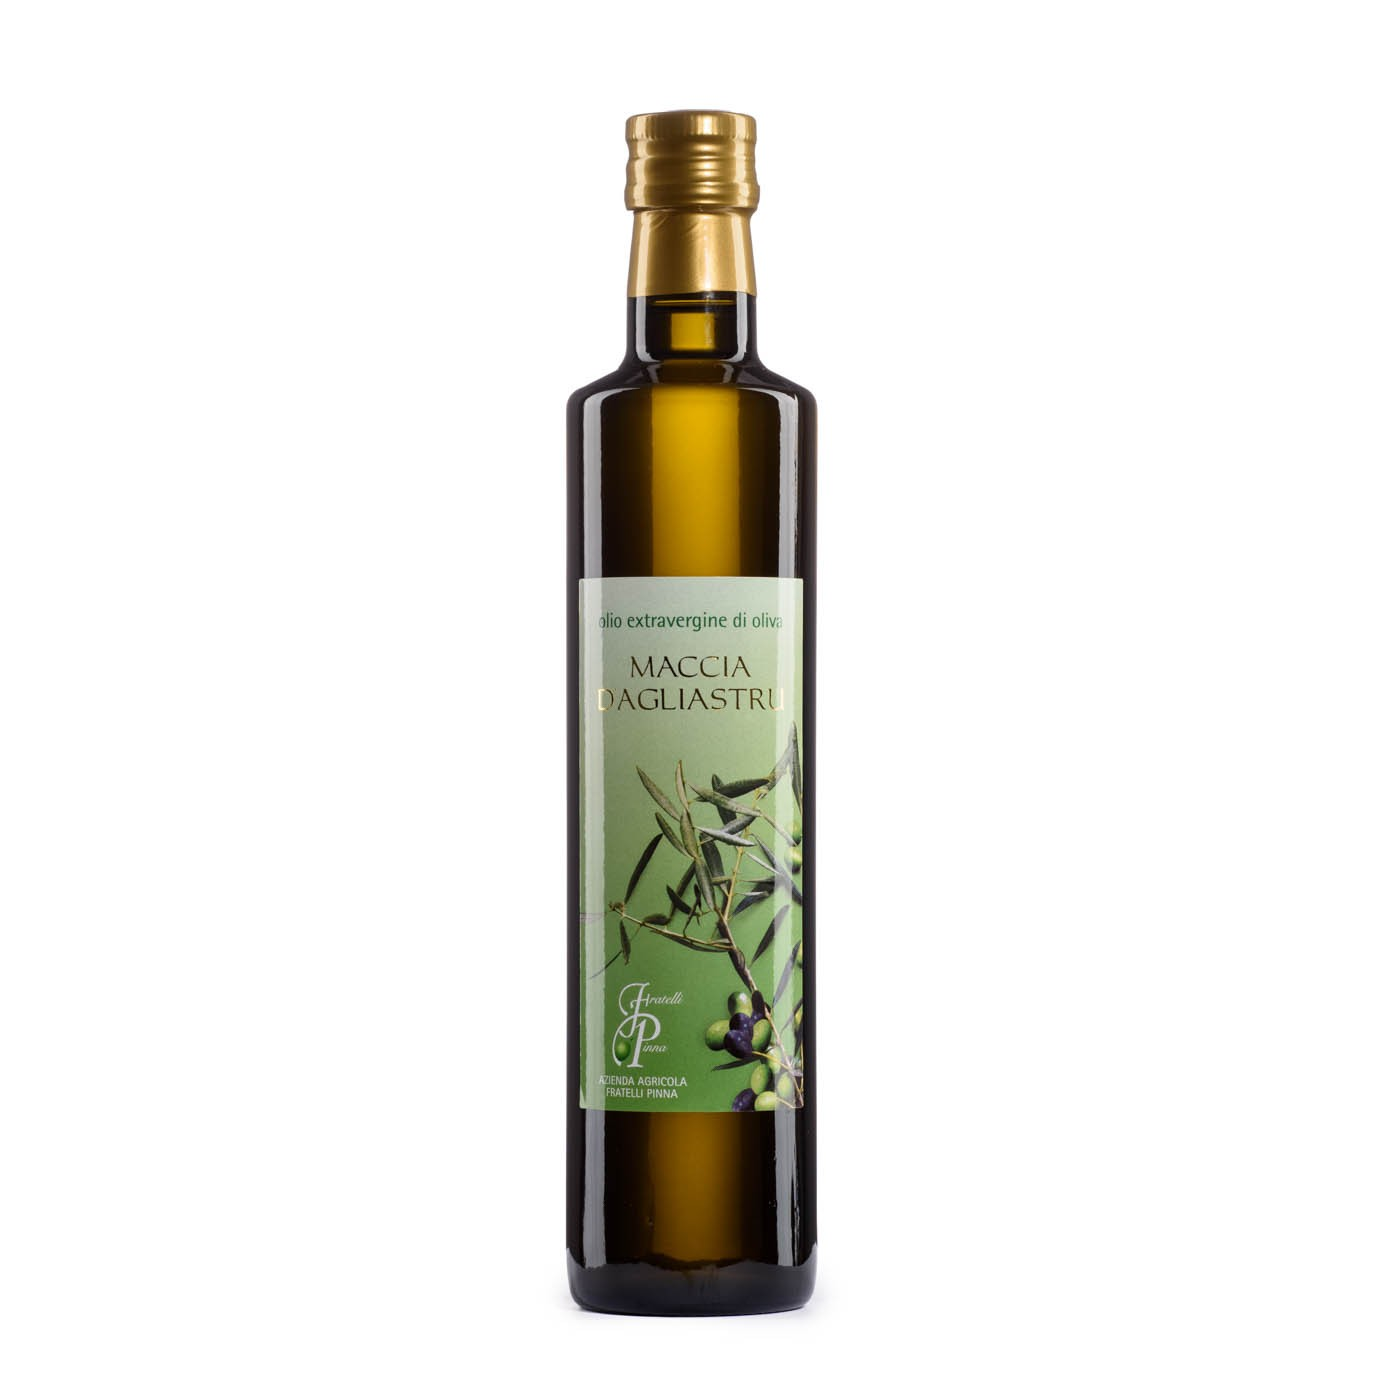 Maccia D'Agliastru Extra Virgin Olive Oil